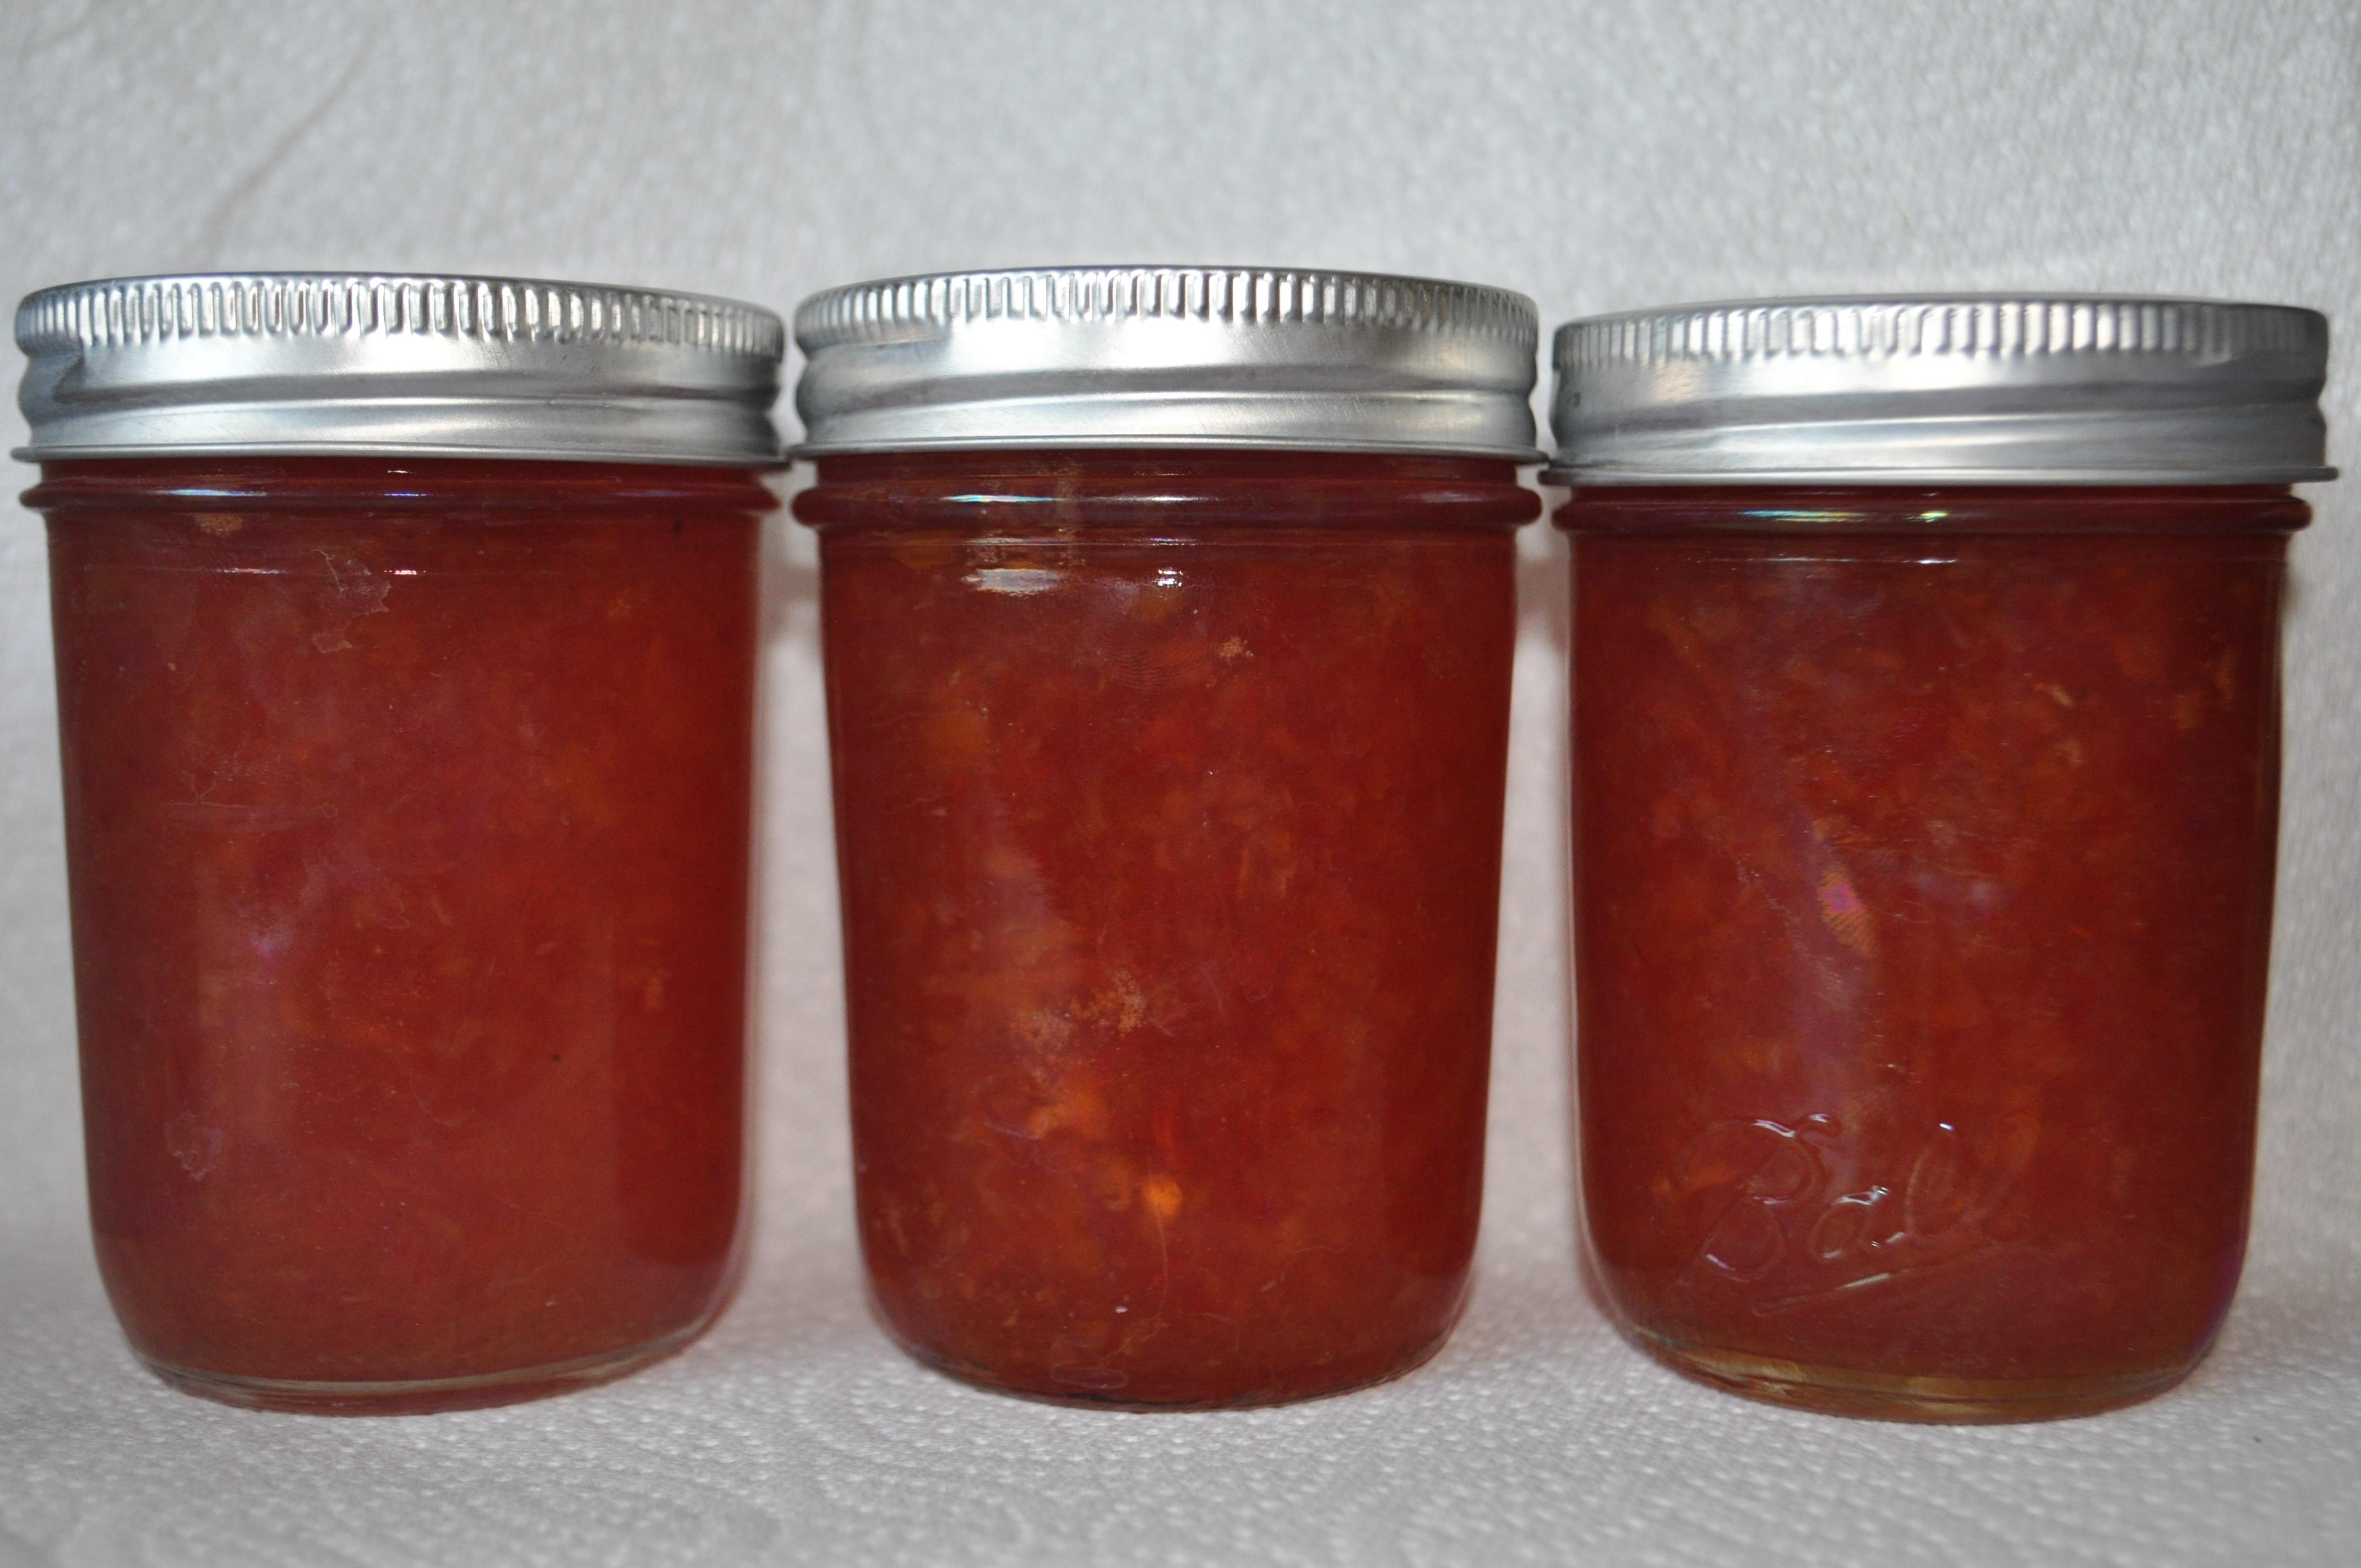 Apricot Habanero Jelly